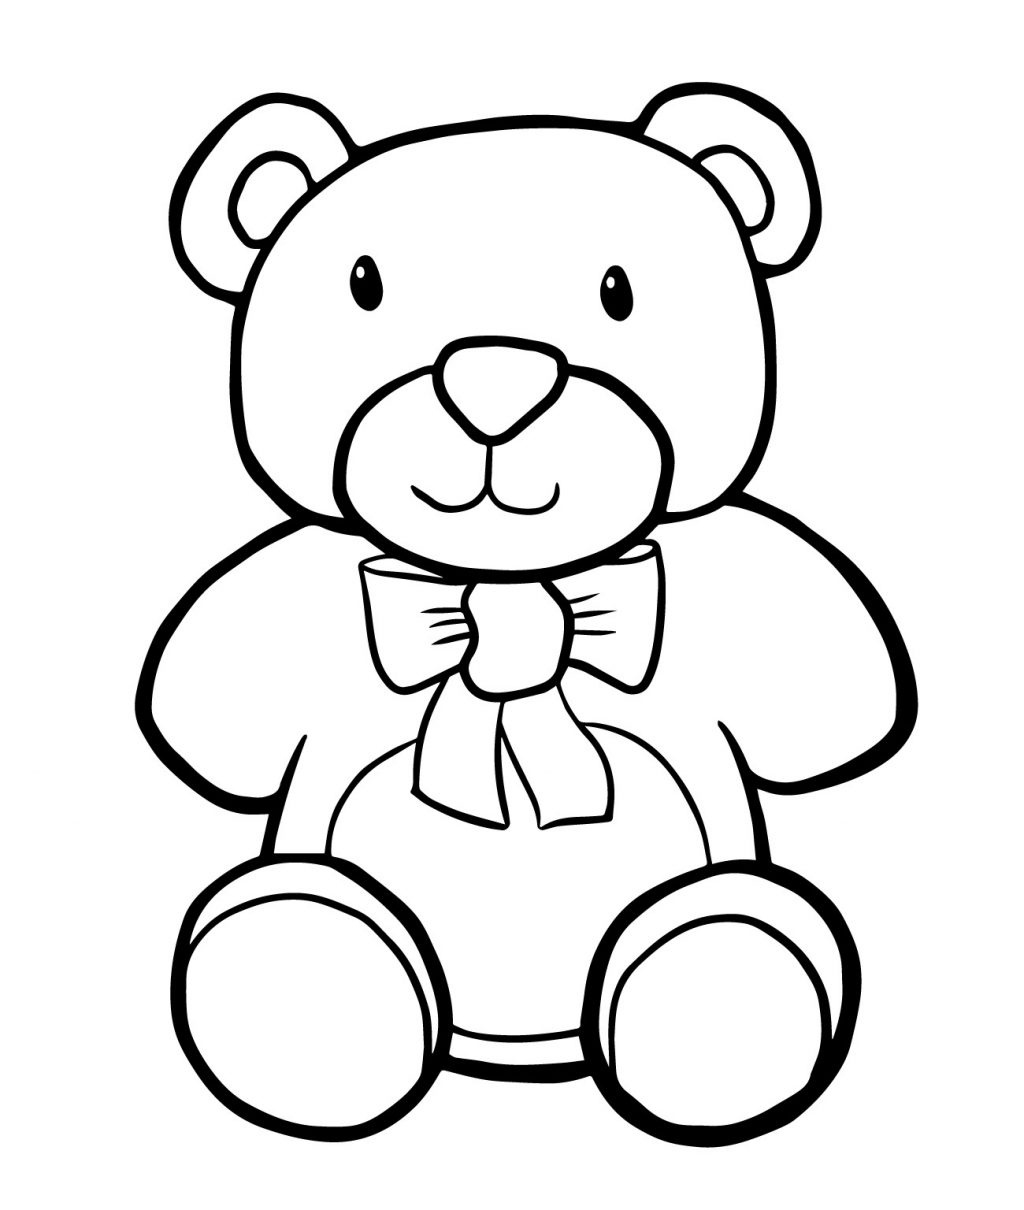 Coloring Ideas : Free Printable Teddy Bear Coloring Pages For Kids - Teddy Bear Coloring Pages Free Printable